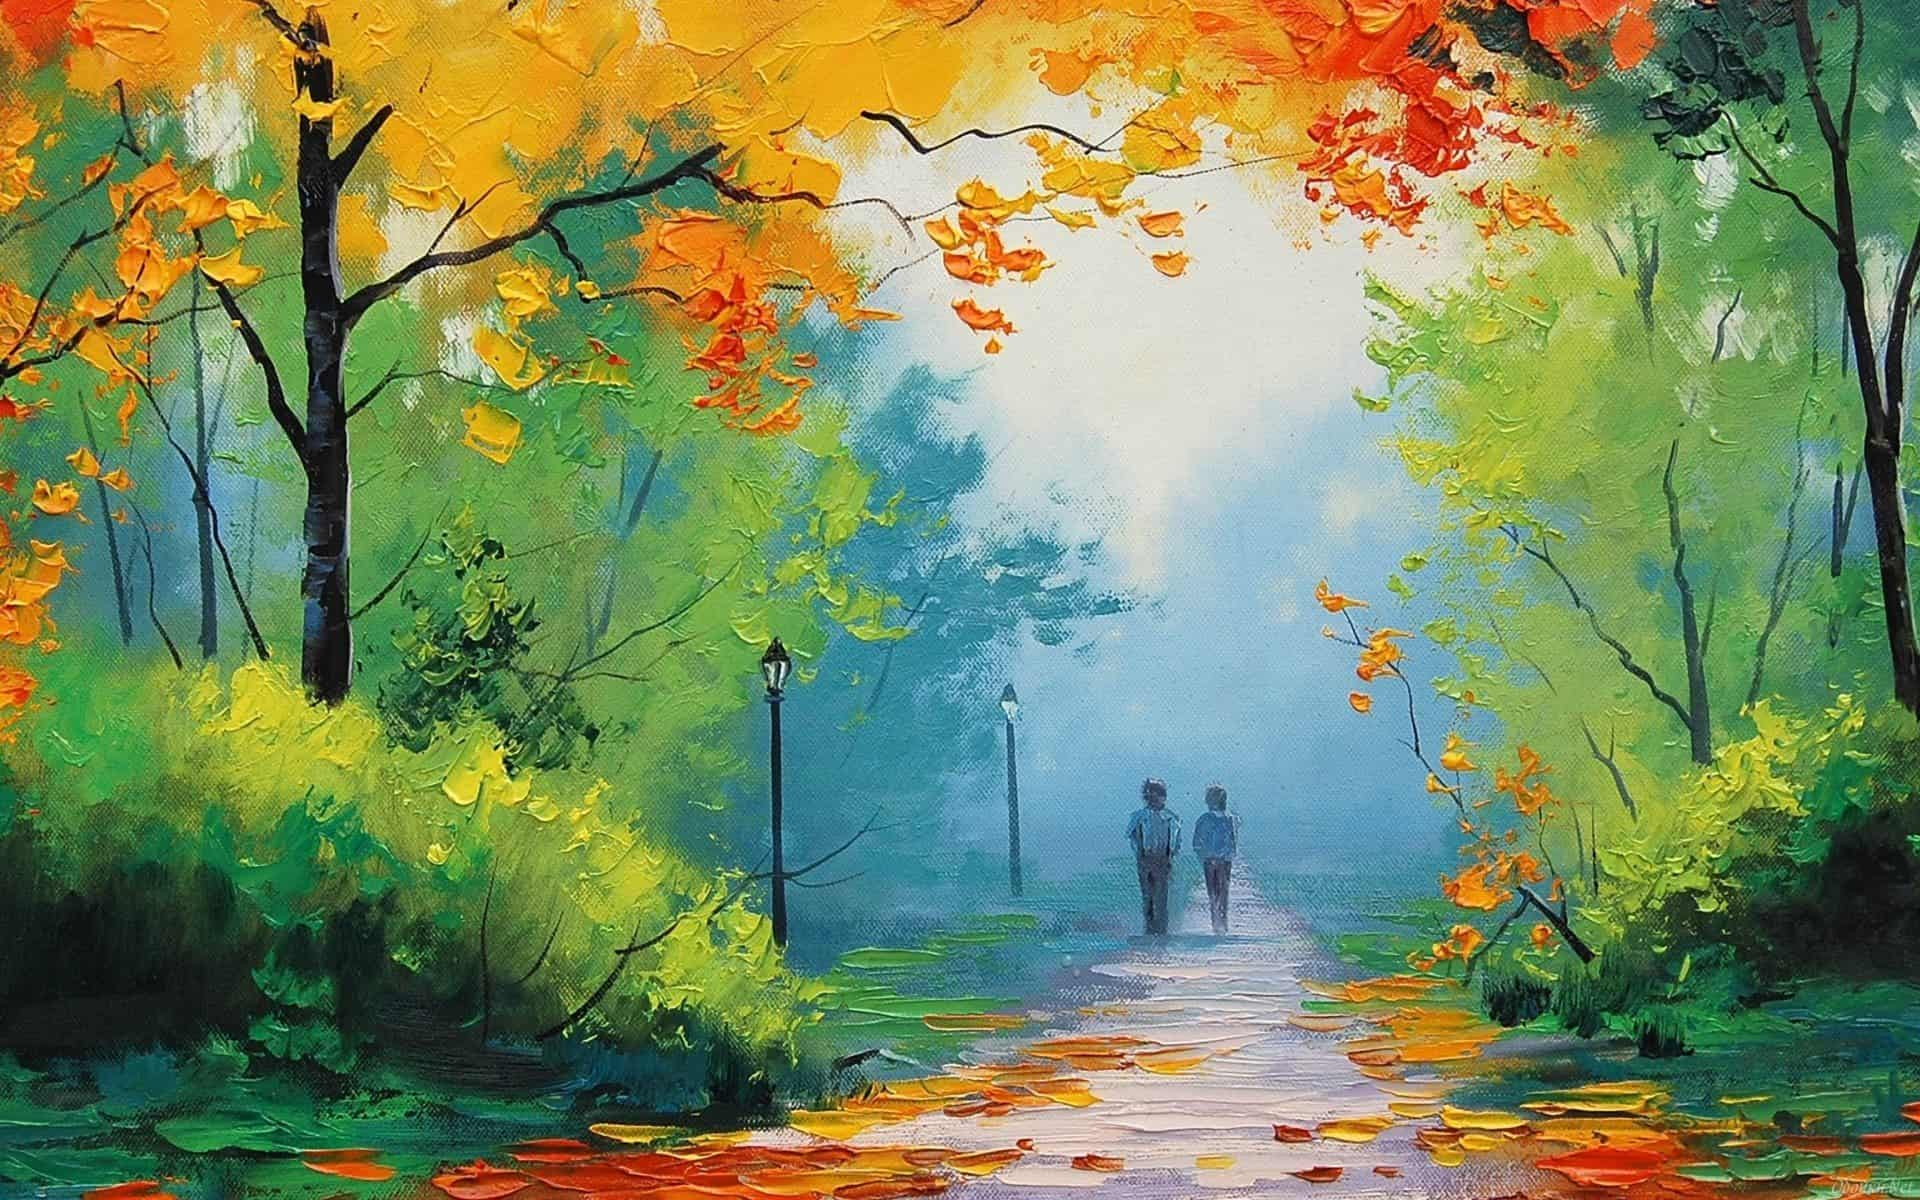 Park nature painting